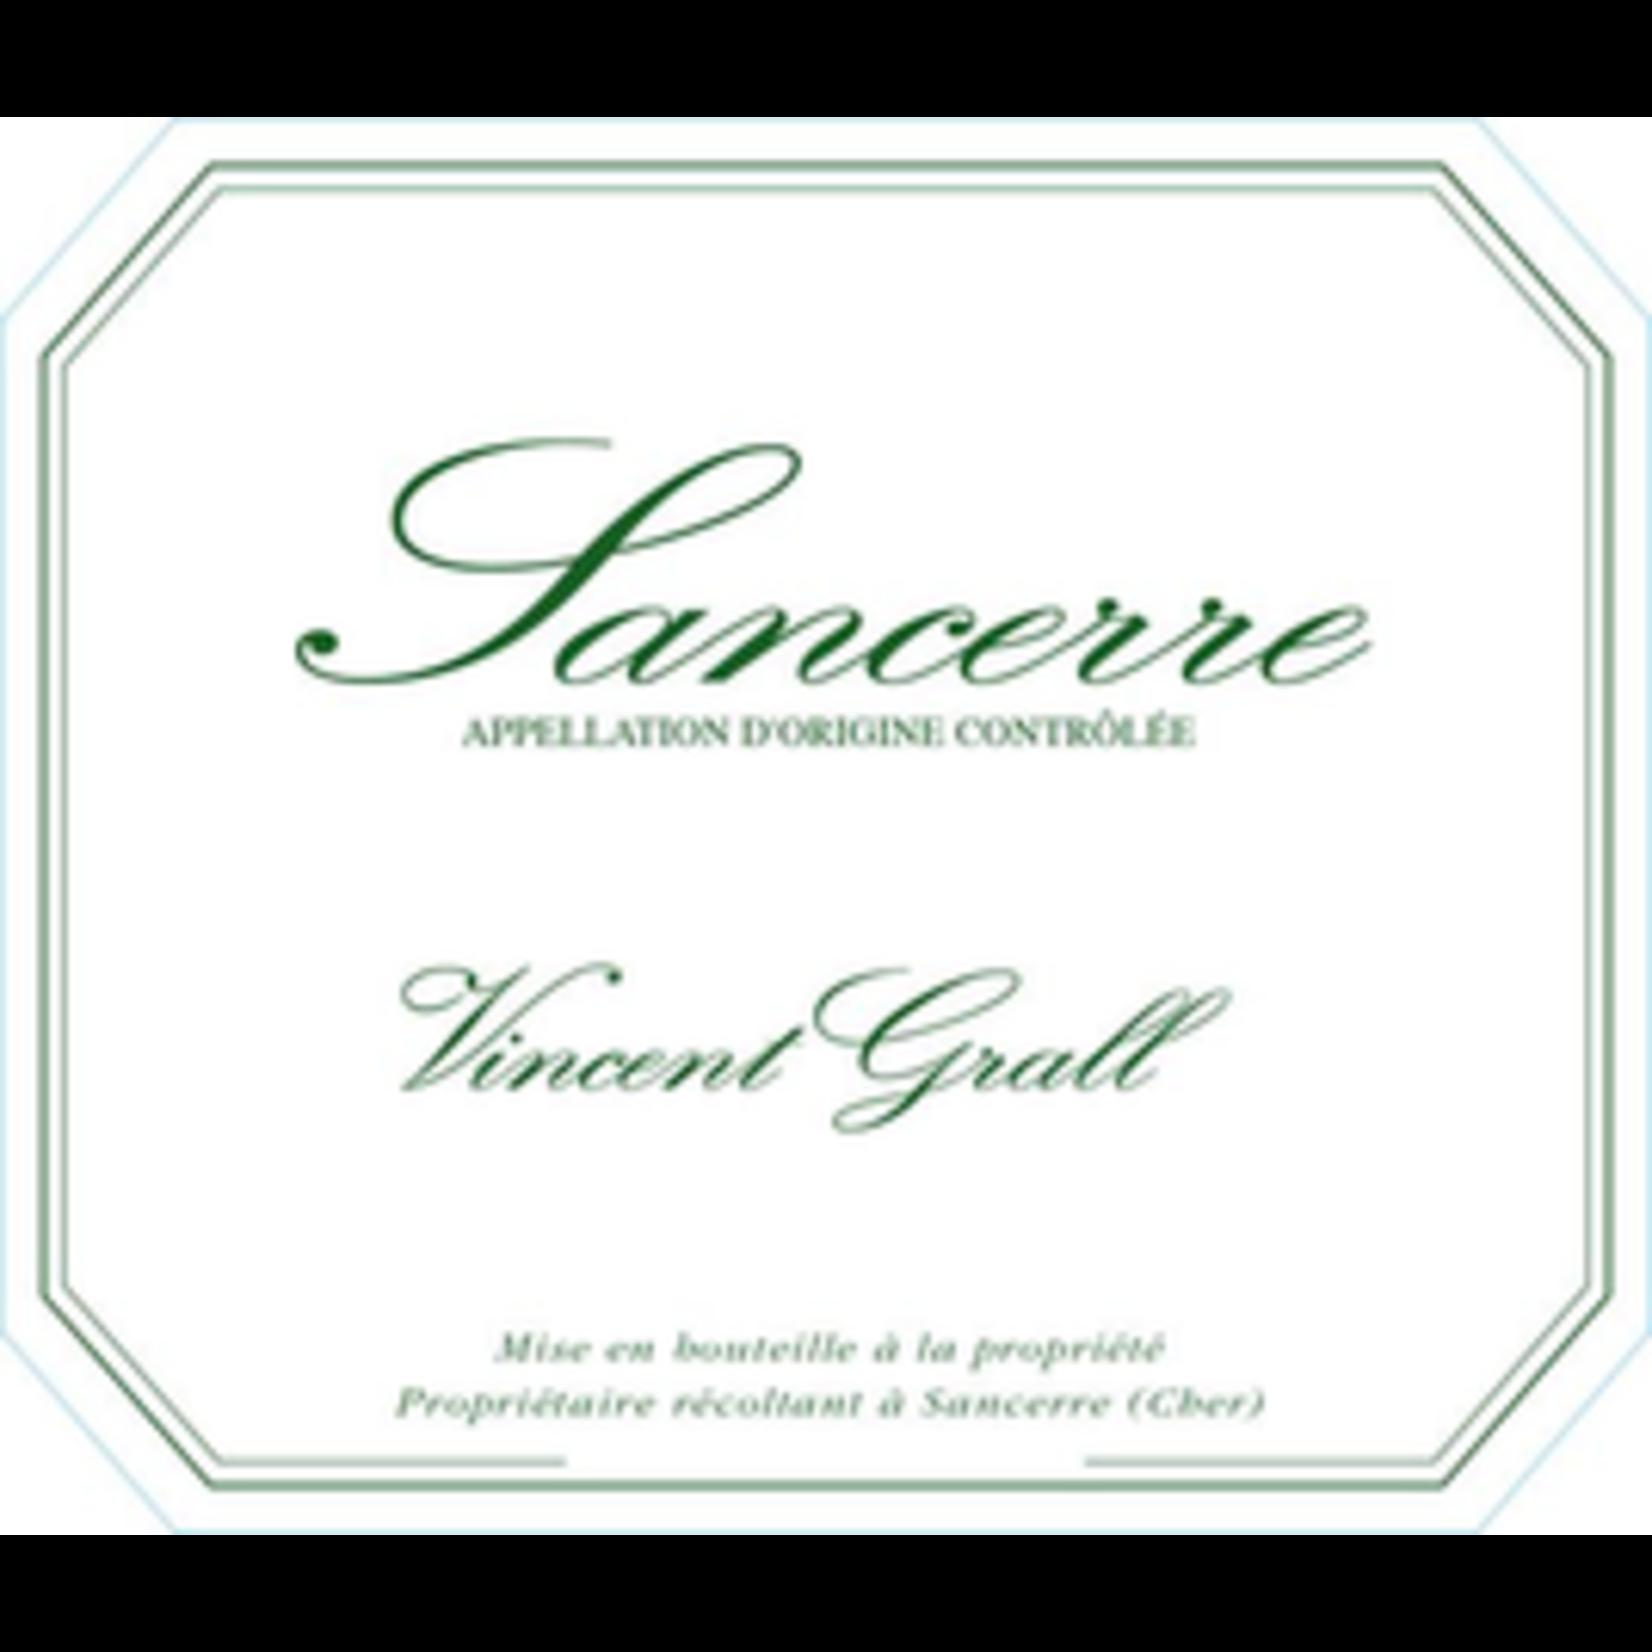 Wine Vincent Grall Sancerre Tradition 2019